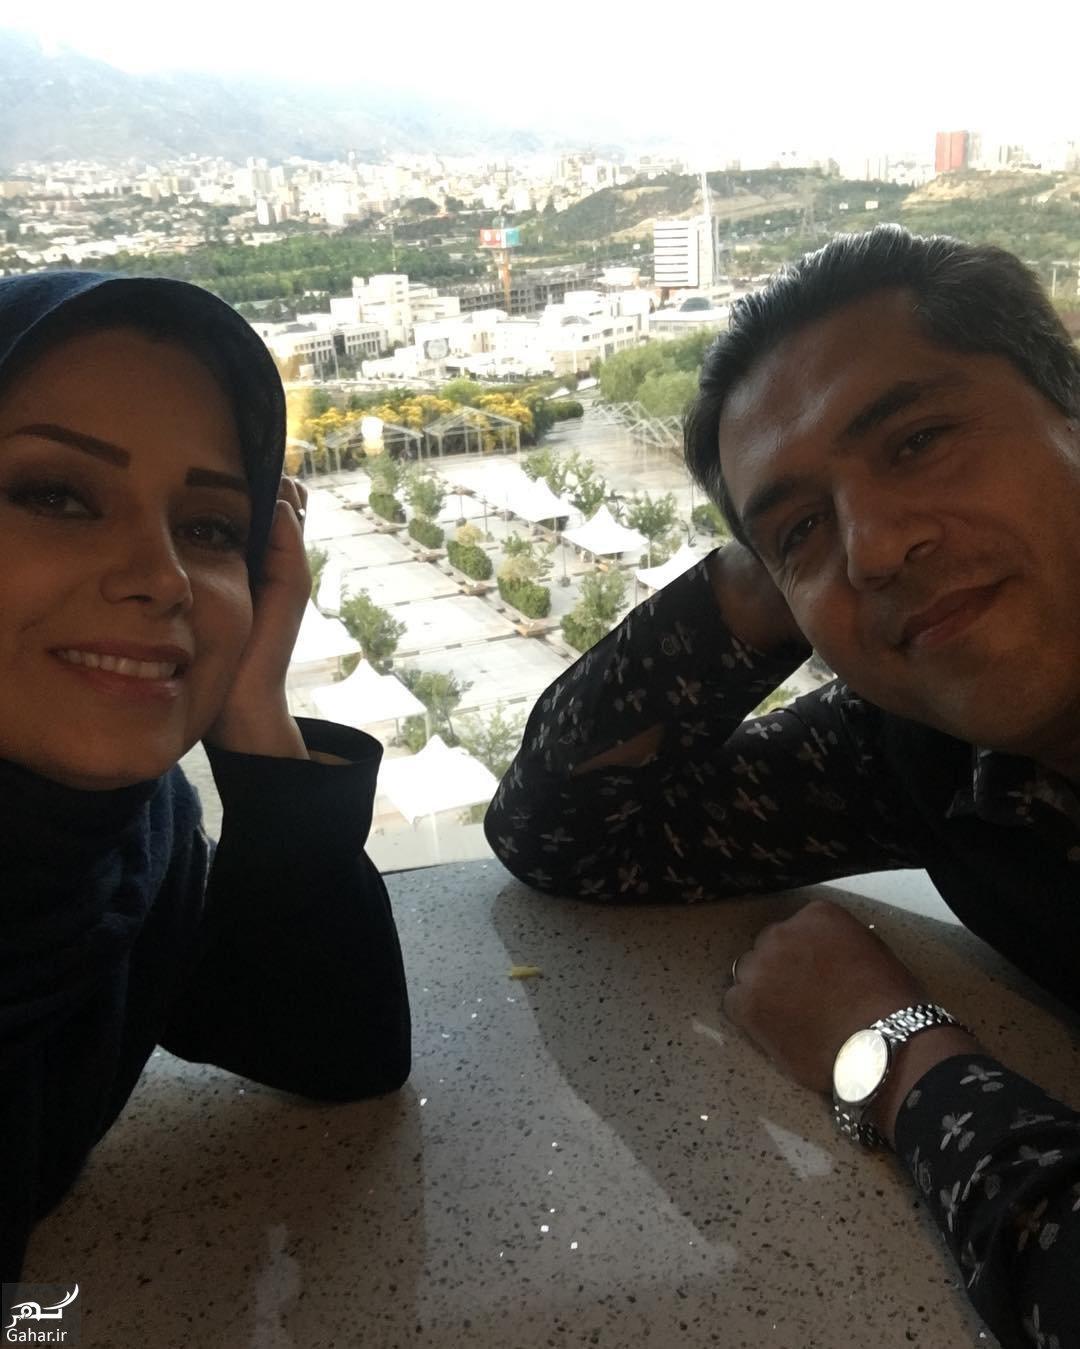 852830 Gahar ir عکس های جذاب و دیدنی صبا راد و همسرش مانی رهنما